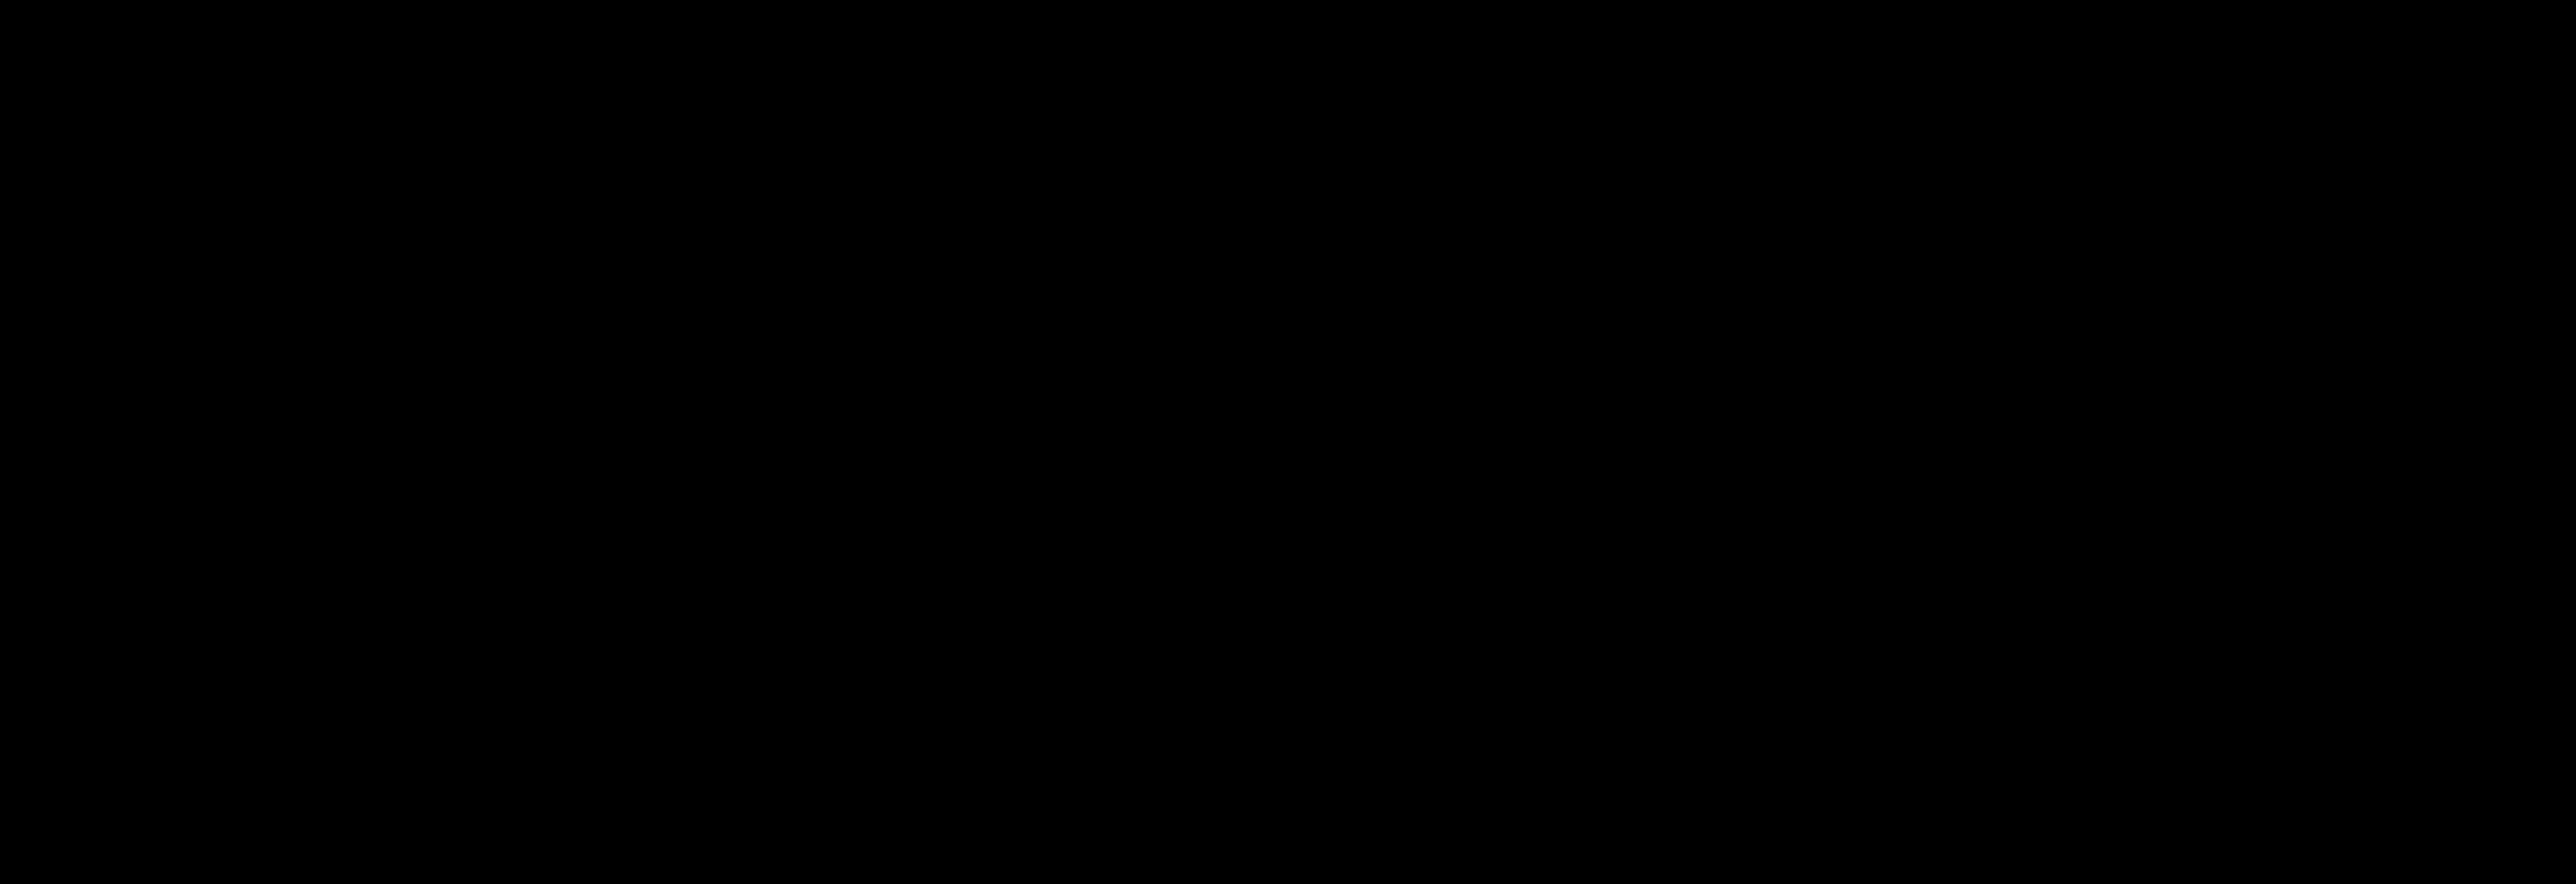 Figure 8: Icon previews